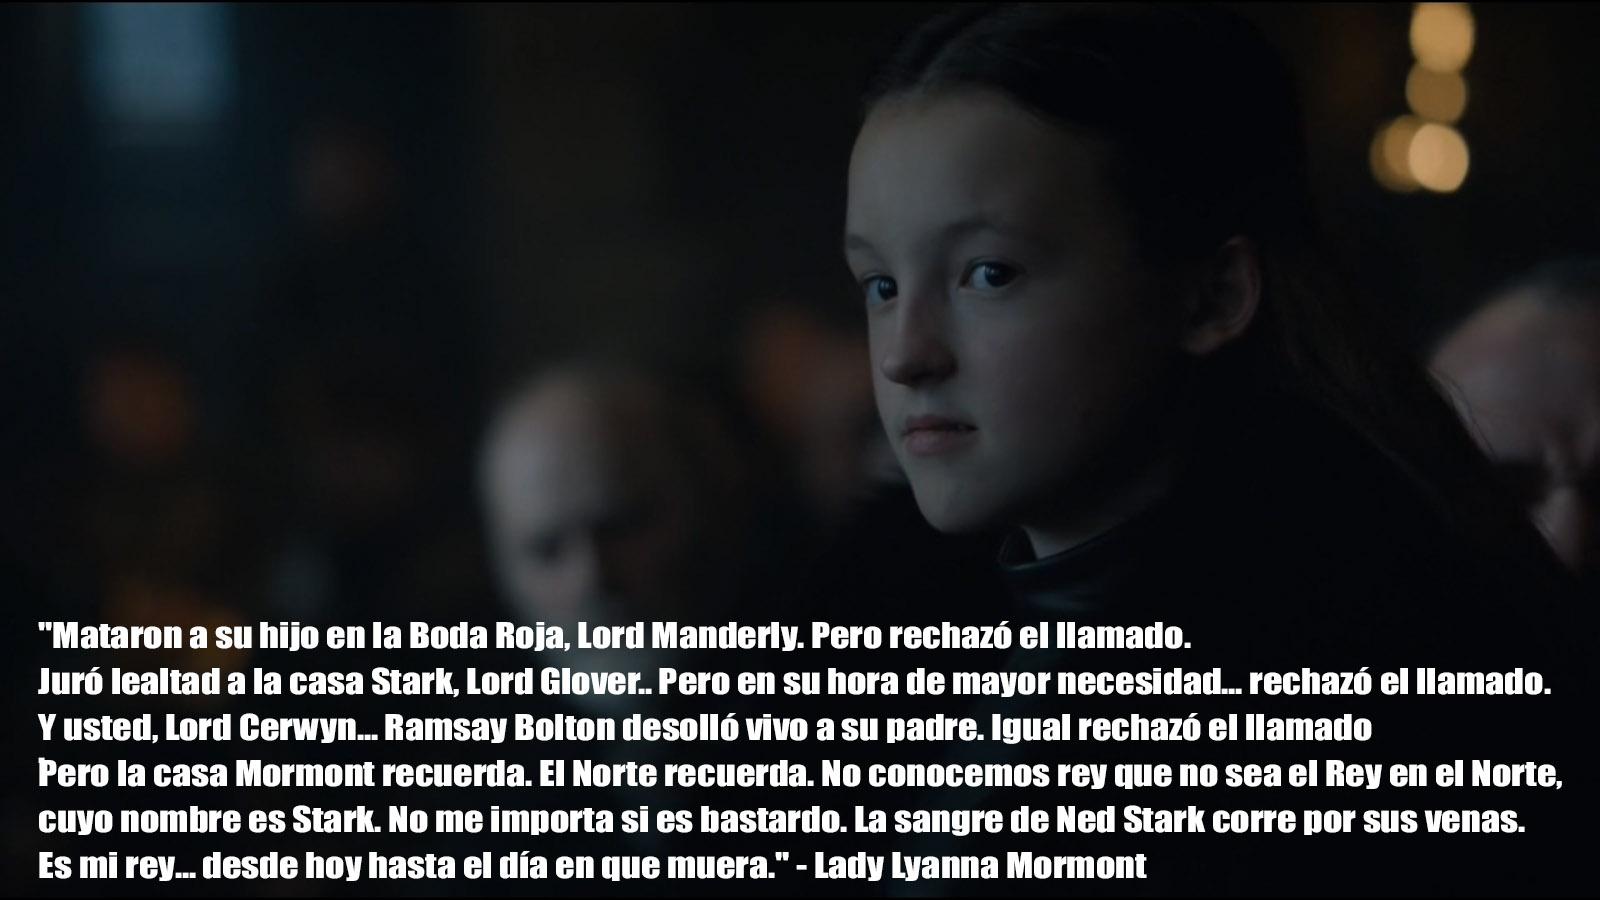 Lyanna Mormont